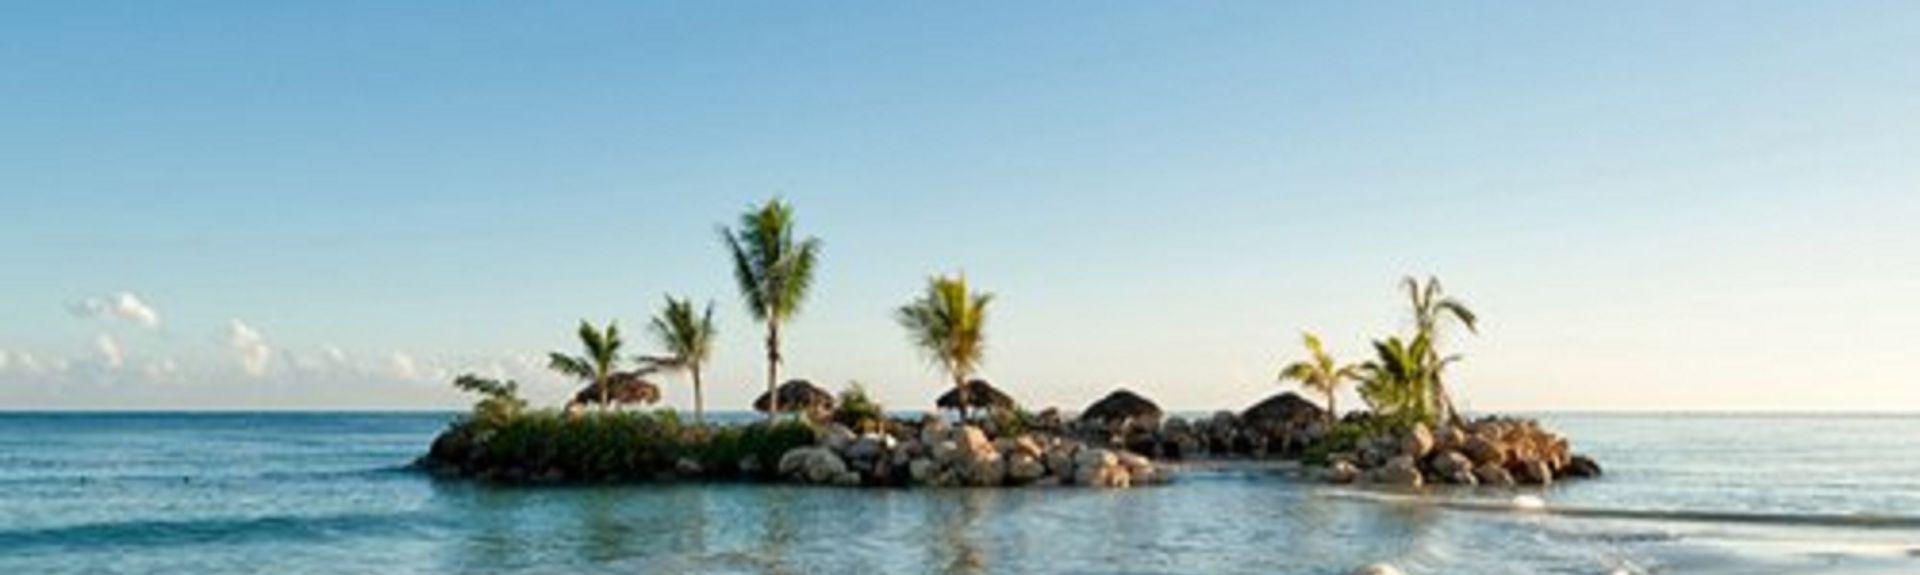 Montego Bay Convention Centre, Montego Bay, Jamaica